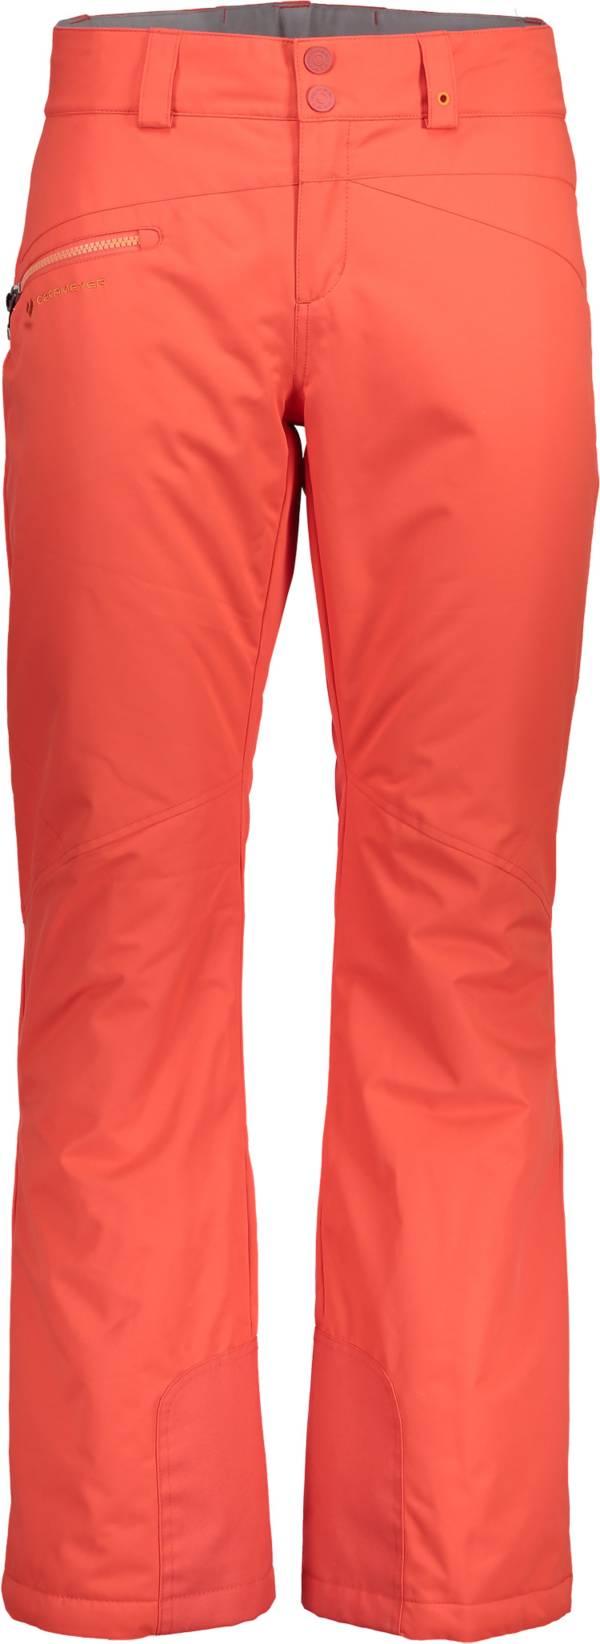 Obermeyer Women's Malta Pants product image